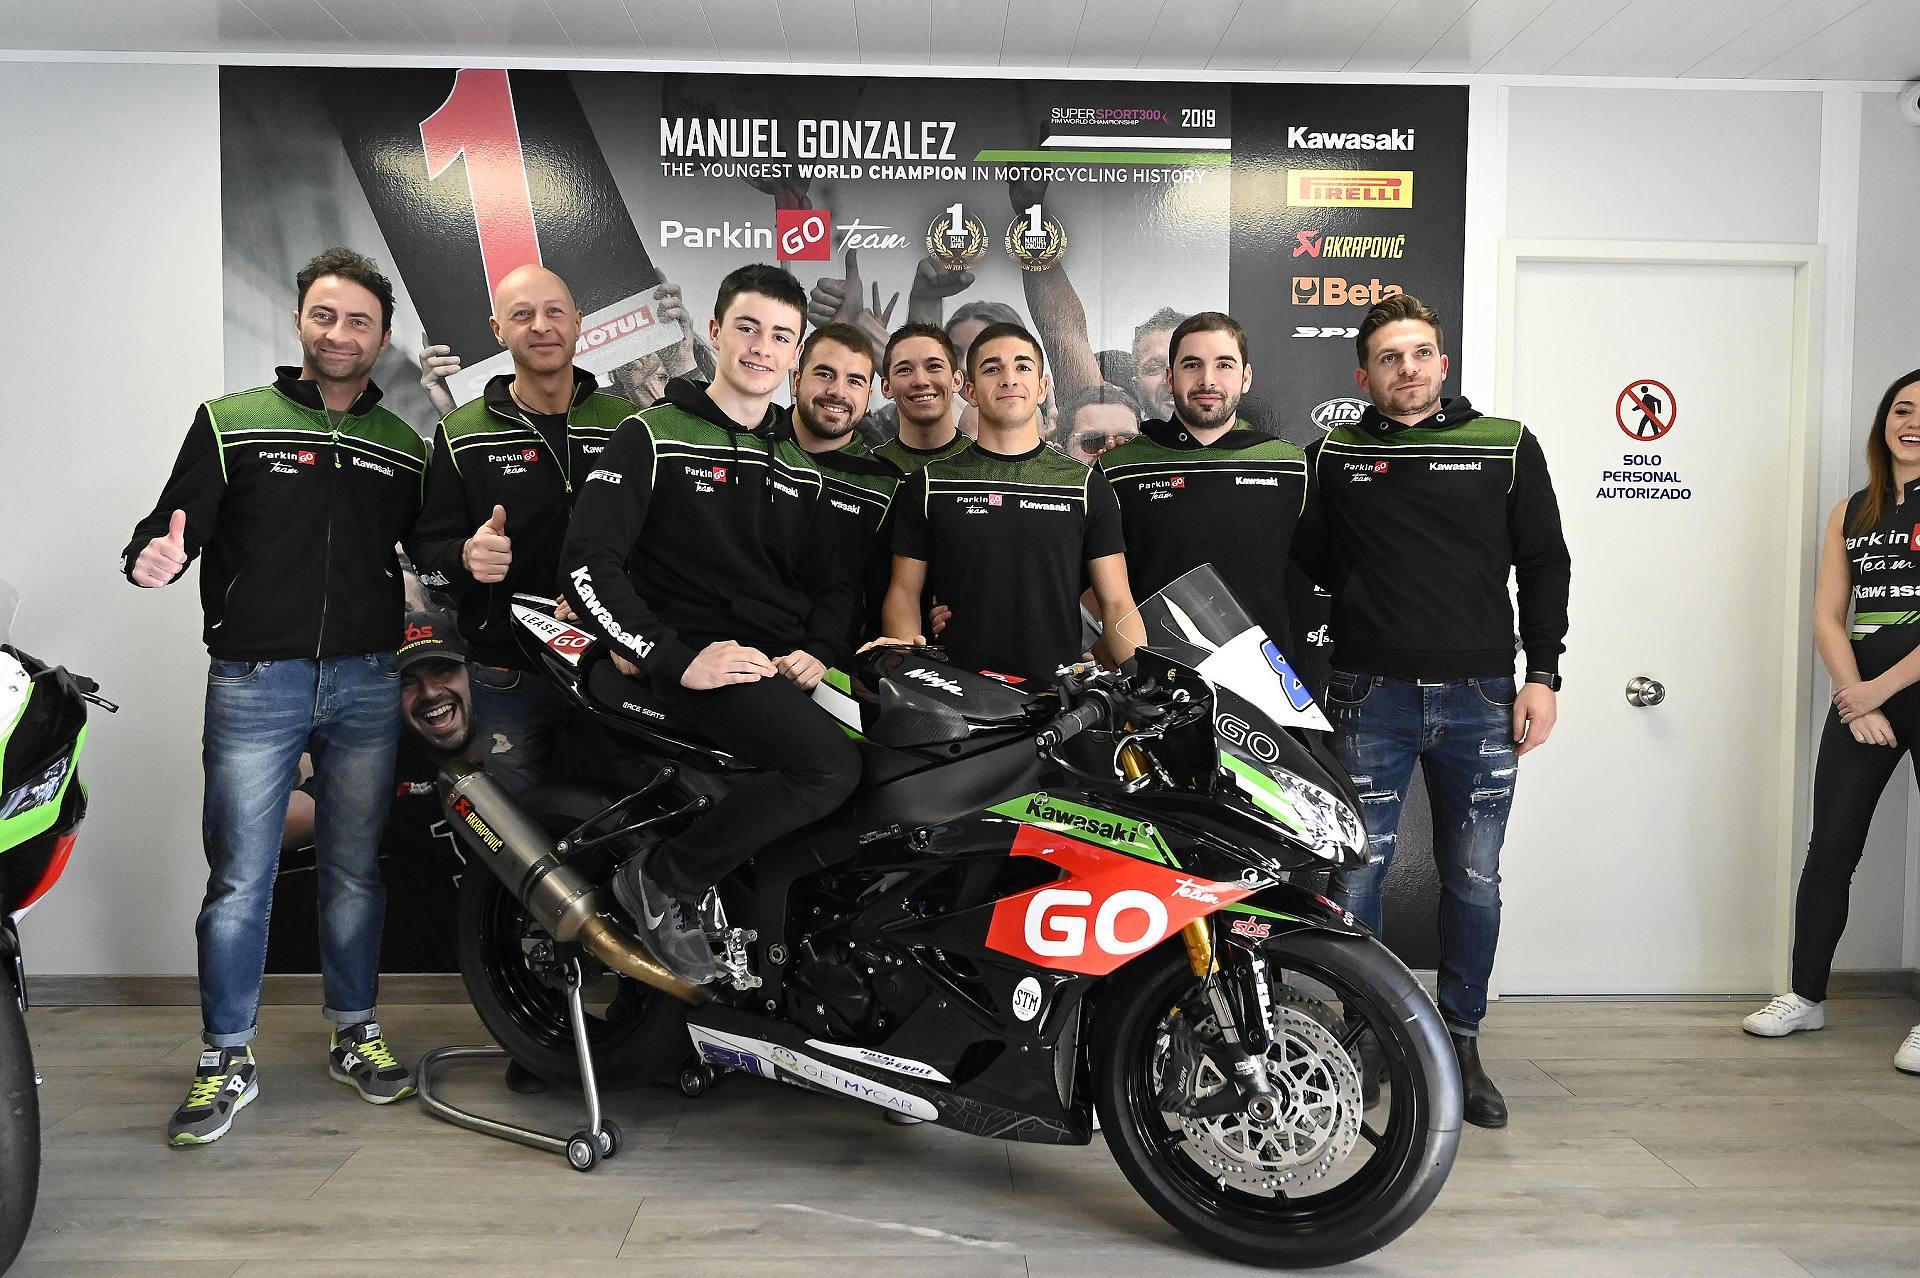 Moto: presentato a Madrid il team ParkinGO Kawasaki 2020